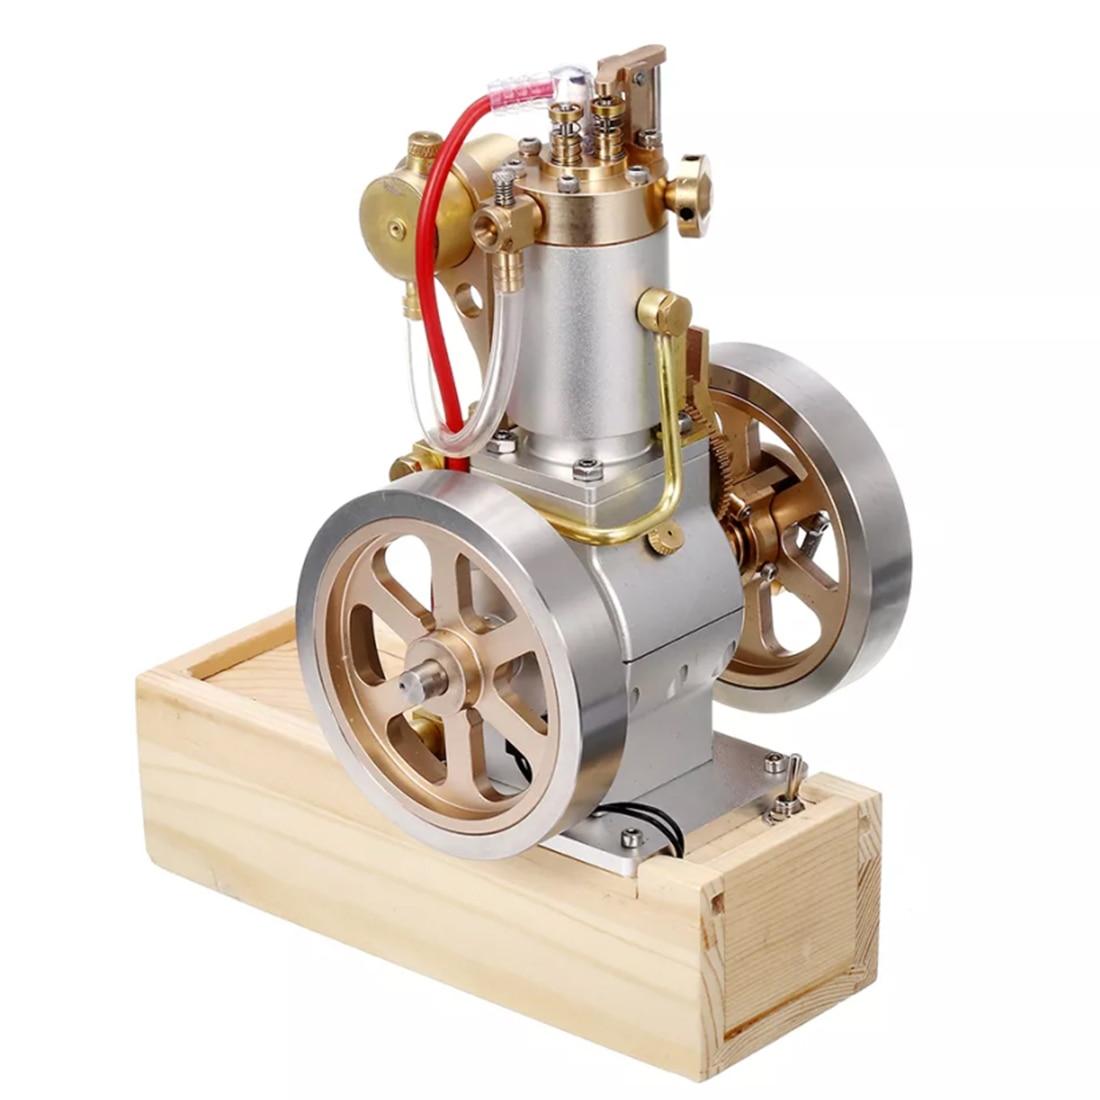 Metal Vertical Hit and Miss completo motor modelo Gas Stirling motor con dispositivo de arranque manual